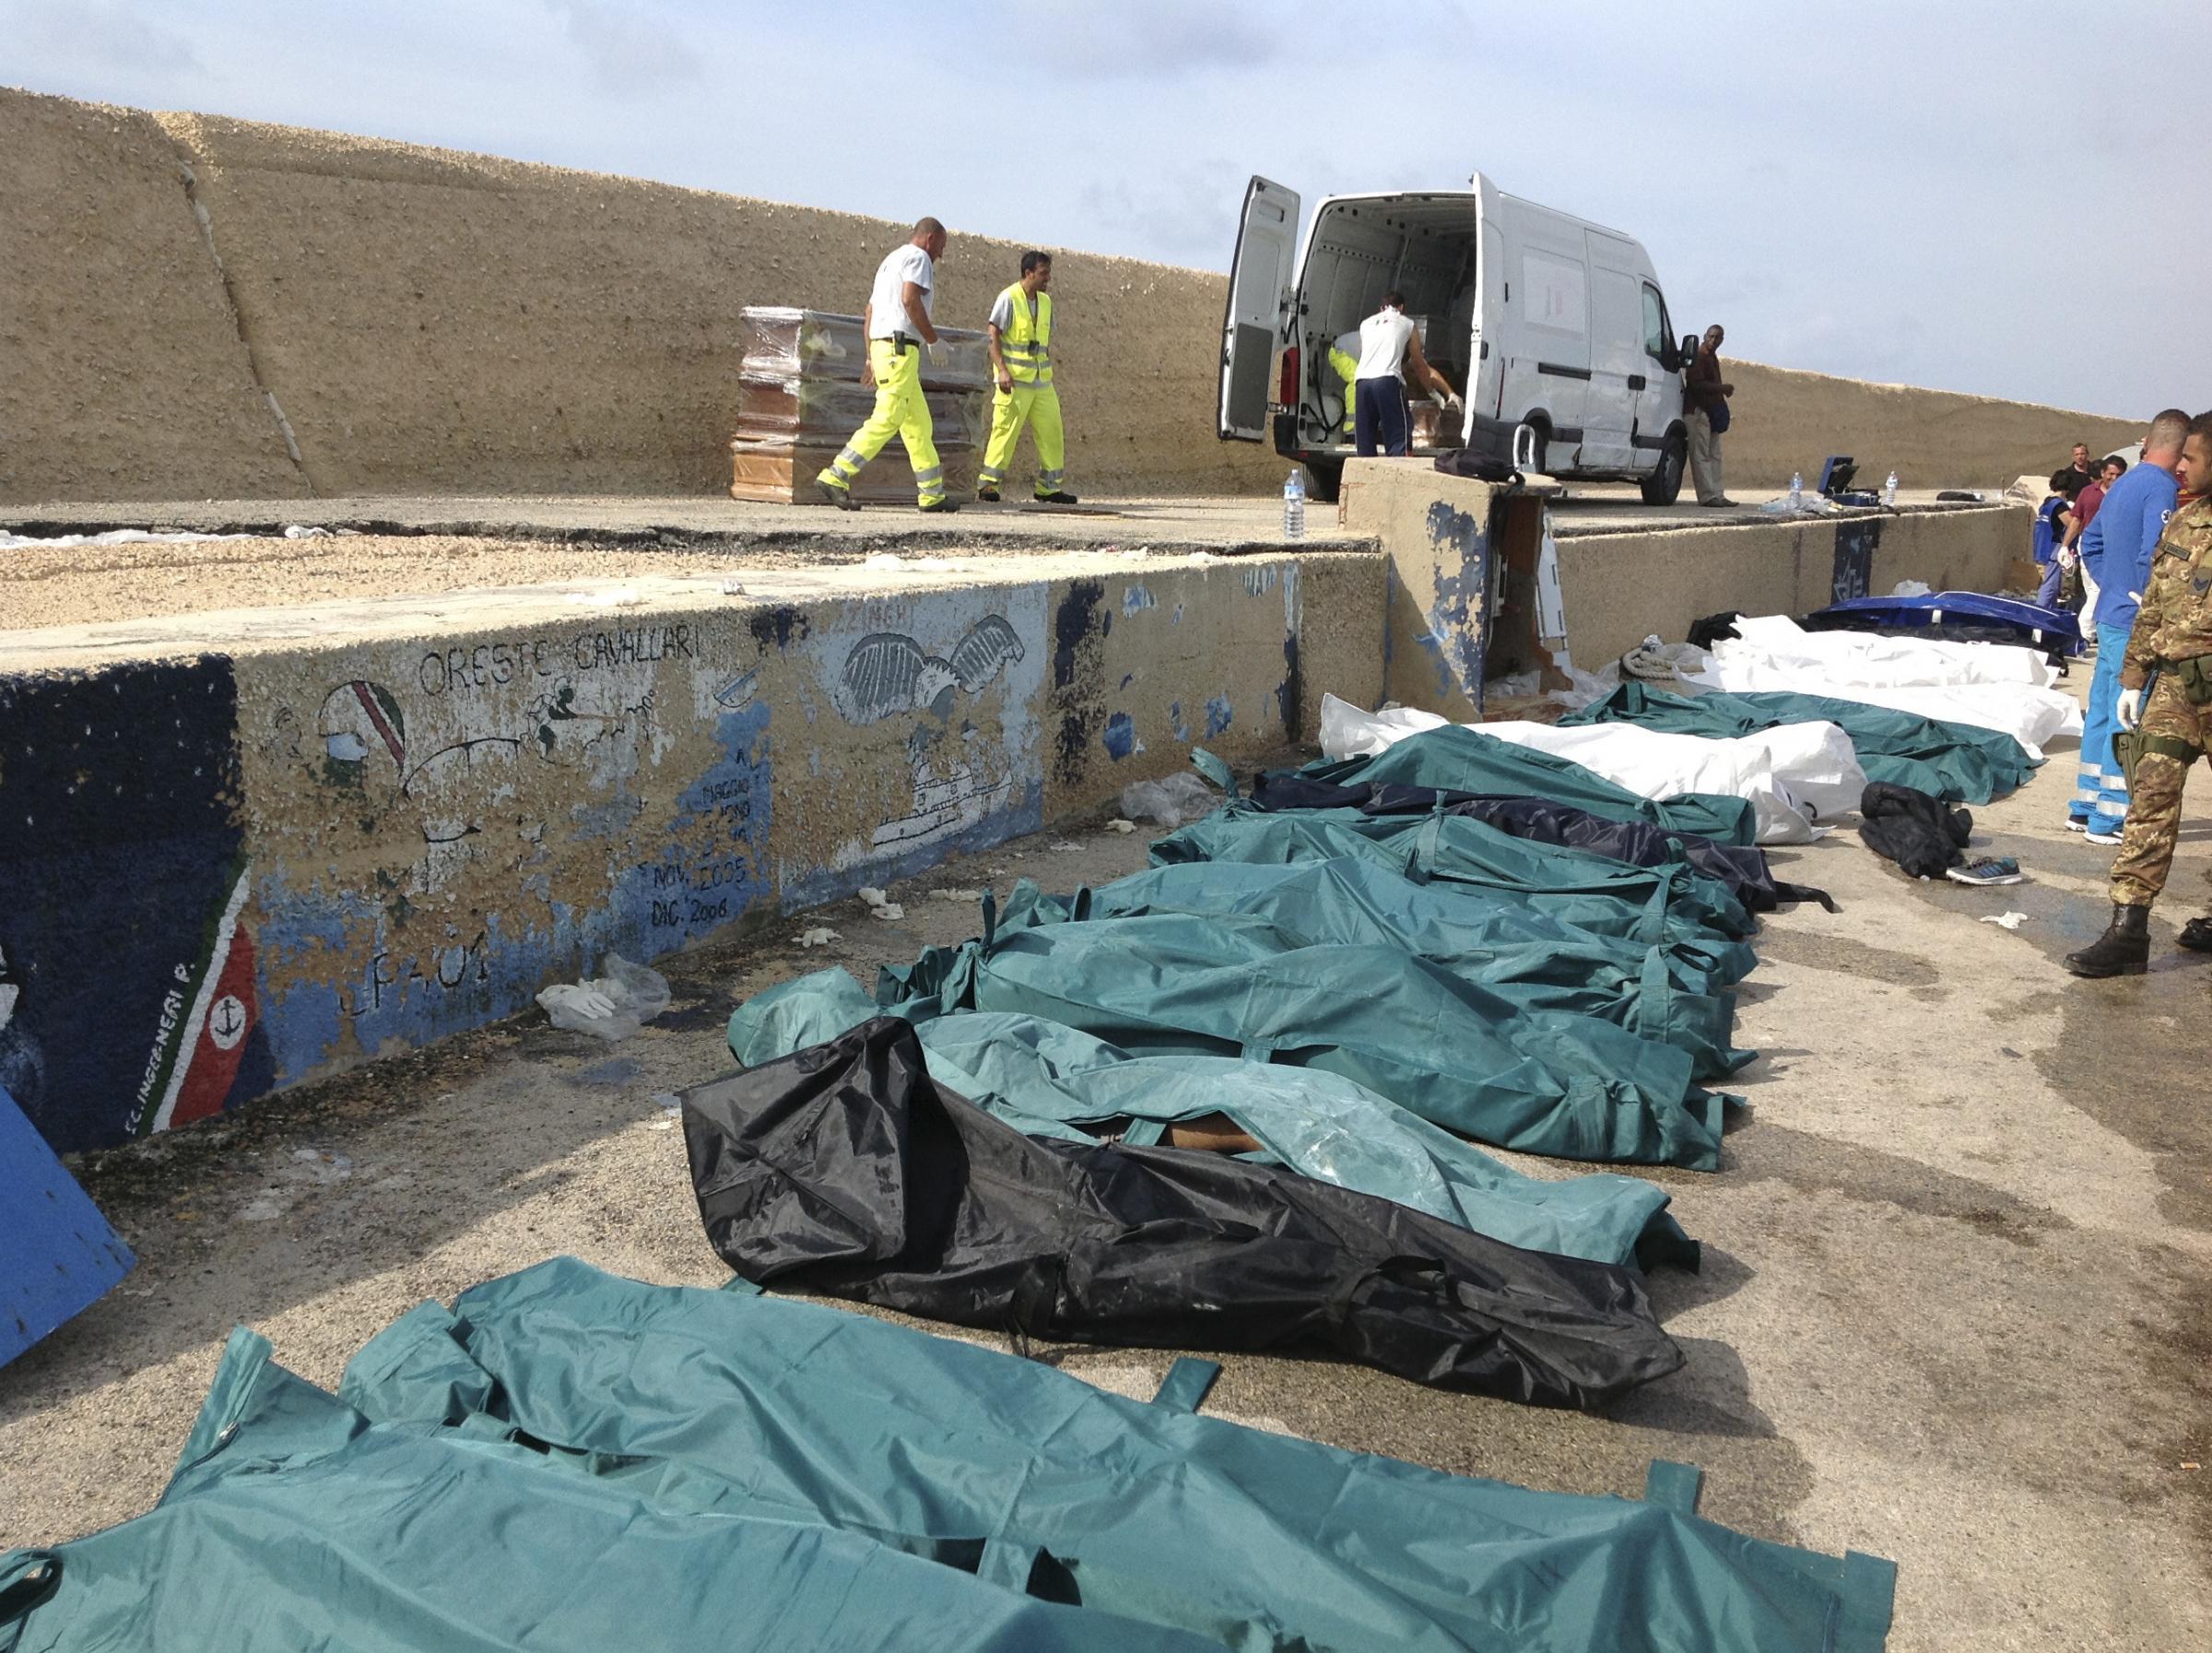 Tragedia a Lampedusa